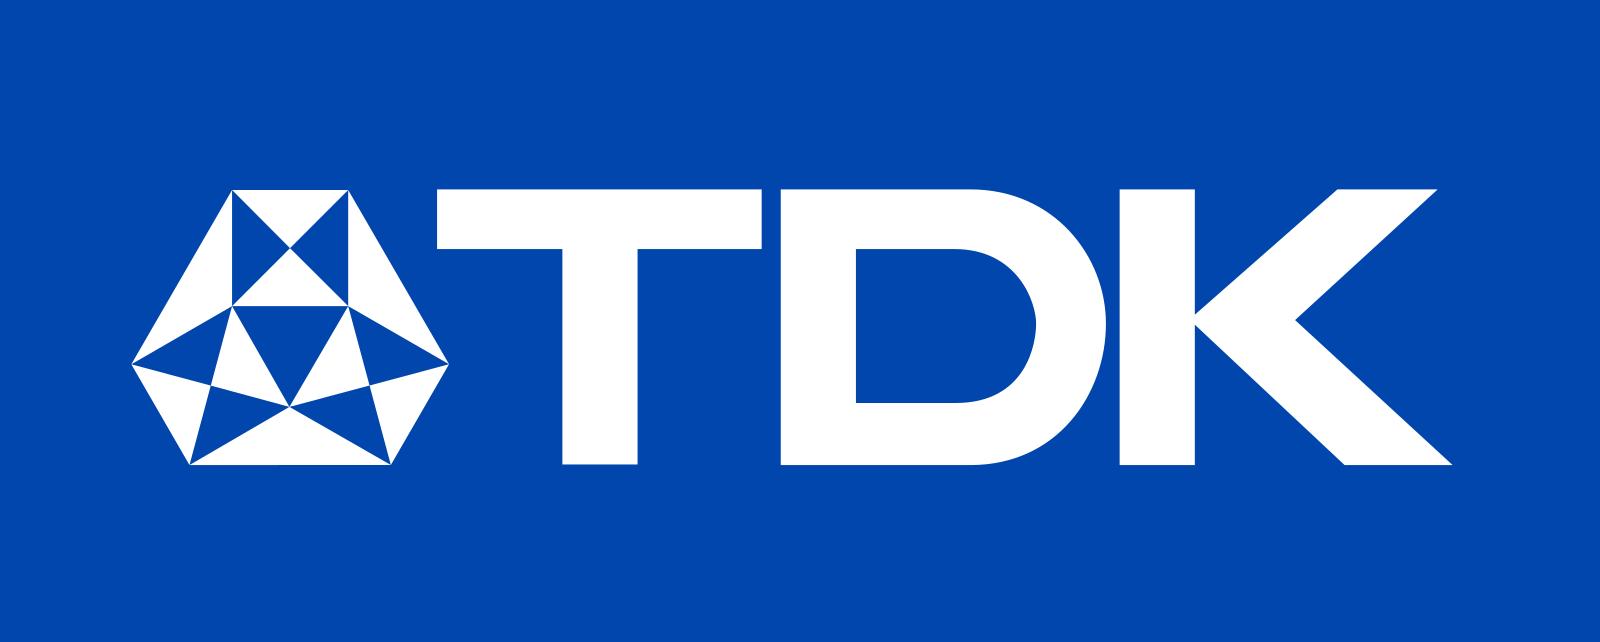 tdk logo 7 - TDK Logo